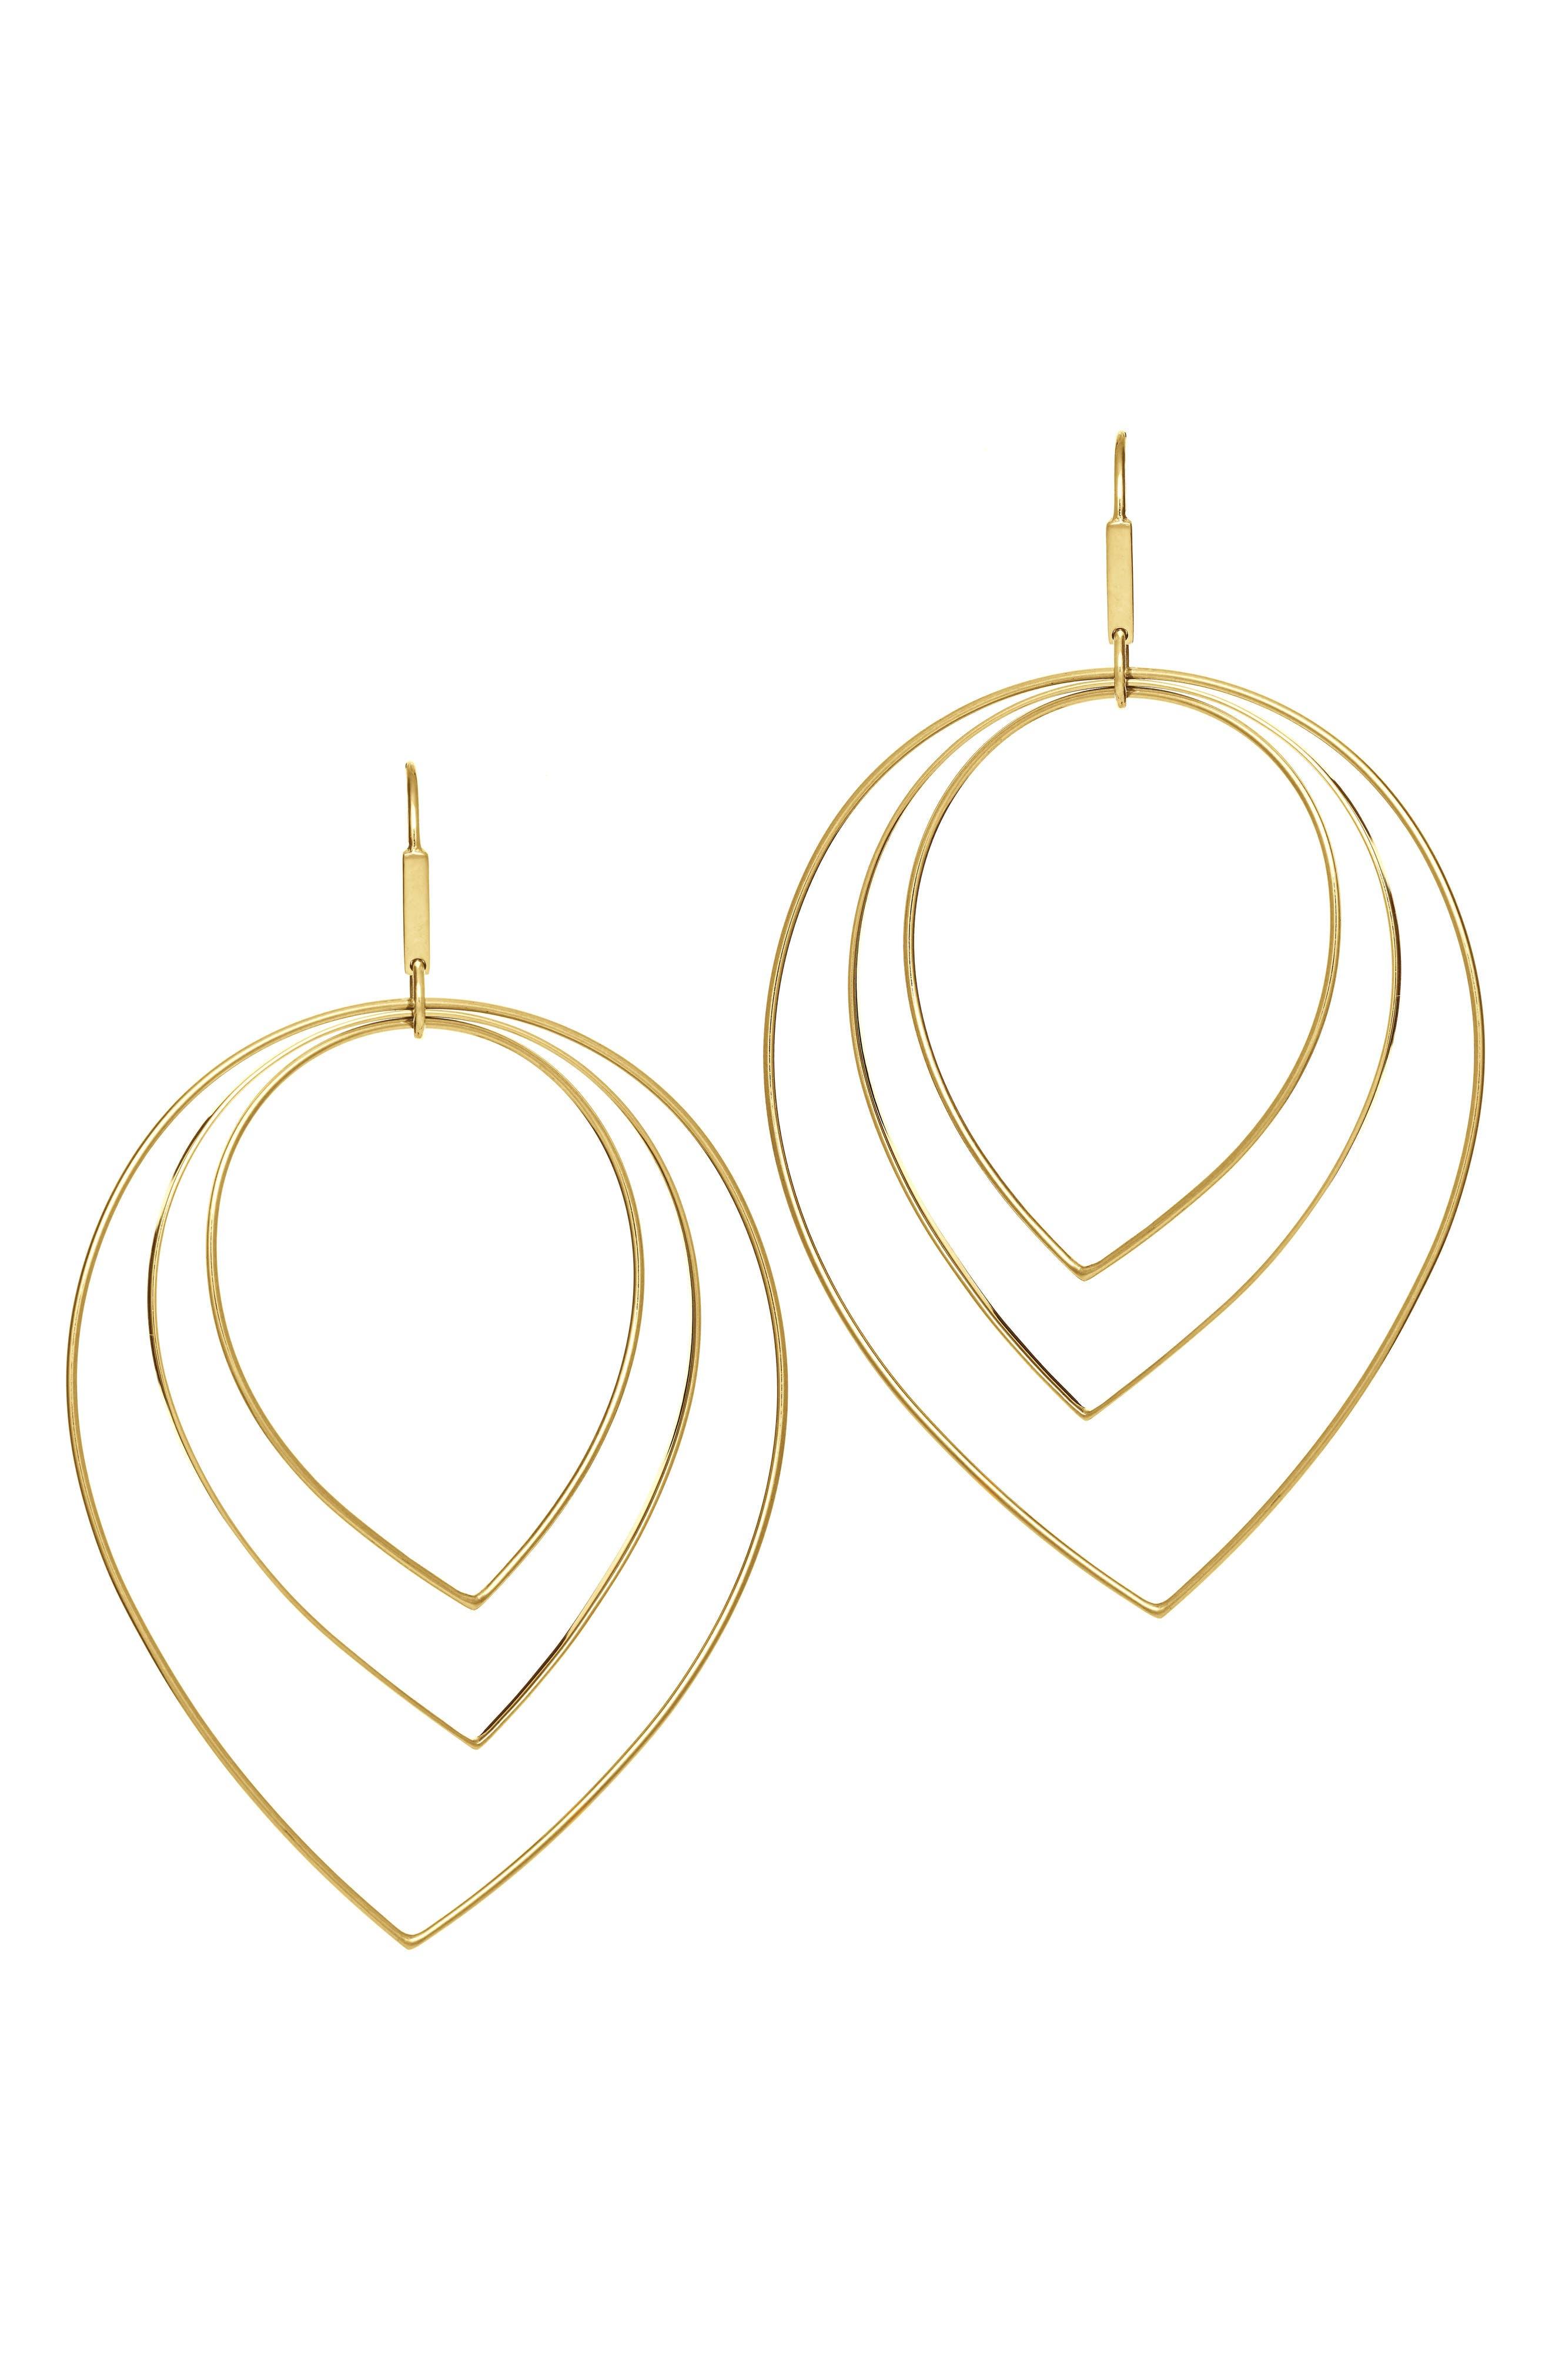 Drop Earrings,                         Main,                         color, YELLOW GOLD